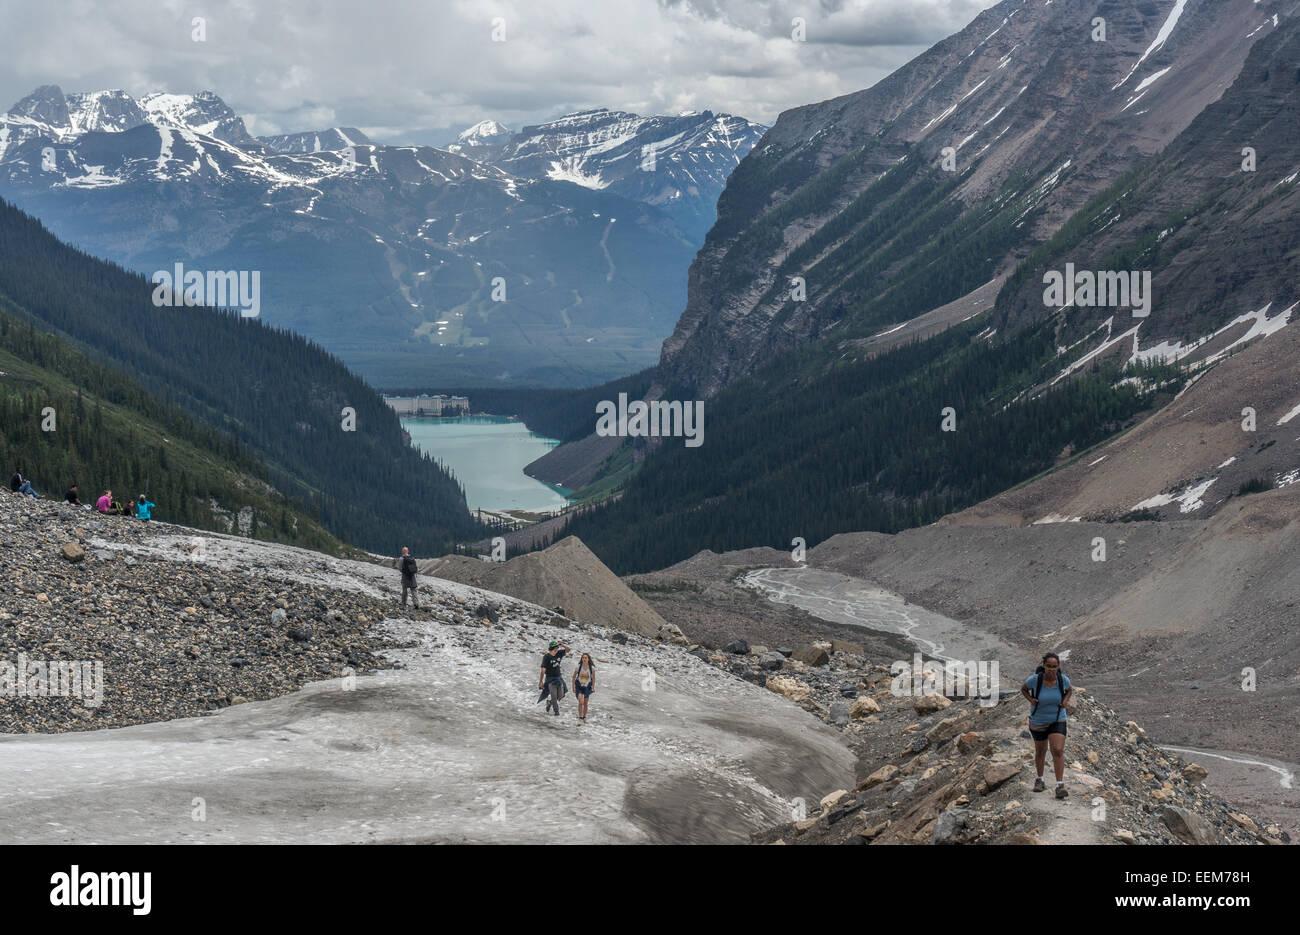 Kanada, Alberta, Banff Nationalpark, Kanadische Rockies, Wanderer, Wandern im Tal Stockbild